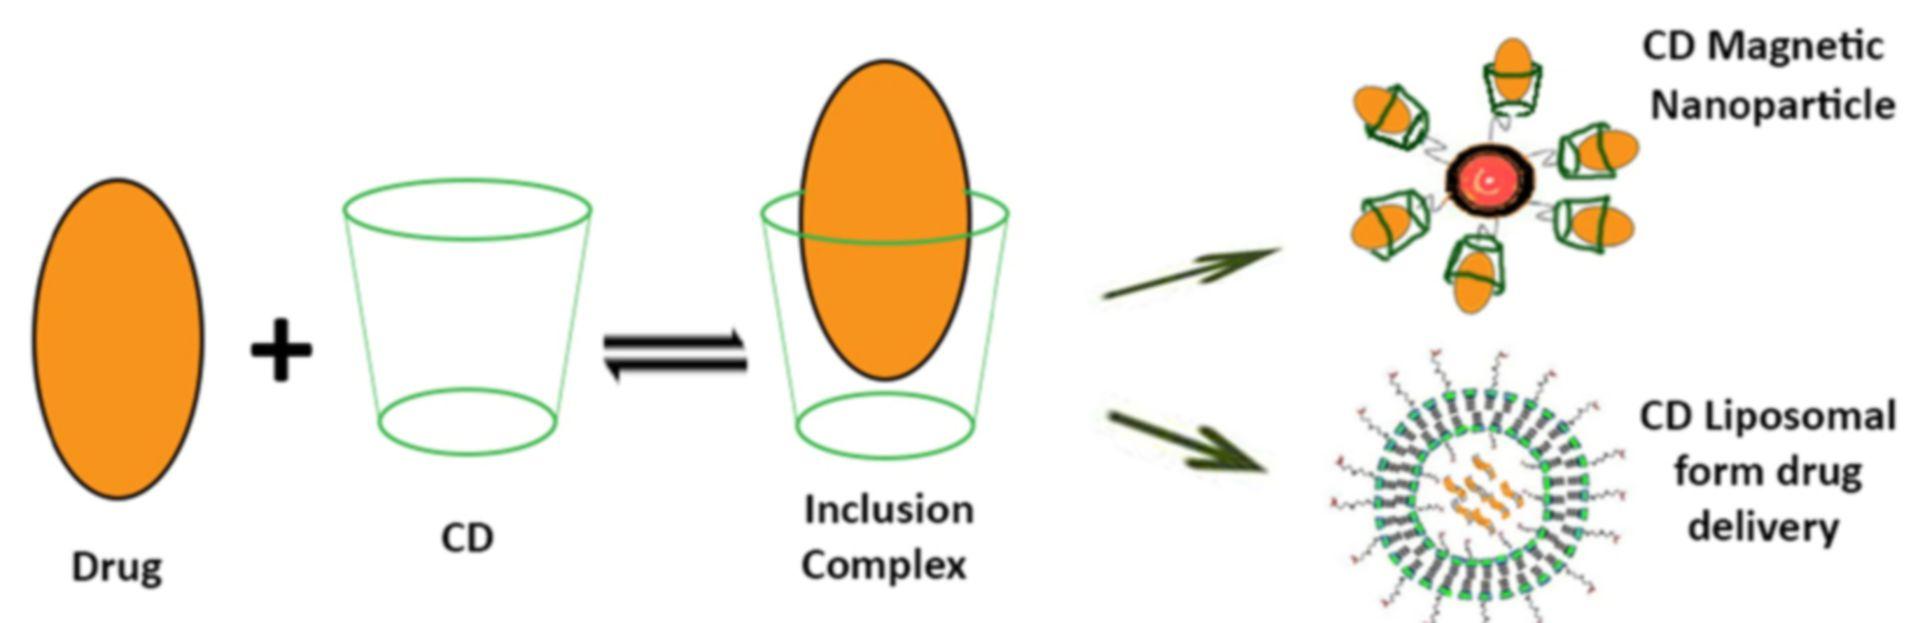 Cyclodextrin-Based Liposome Production